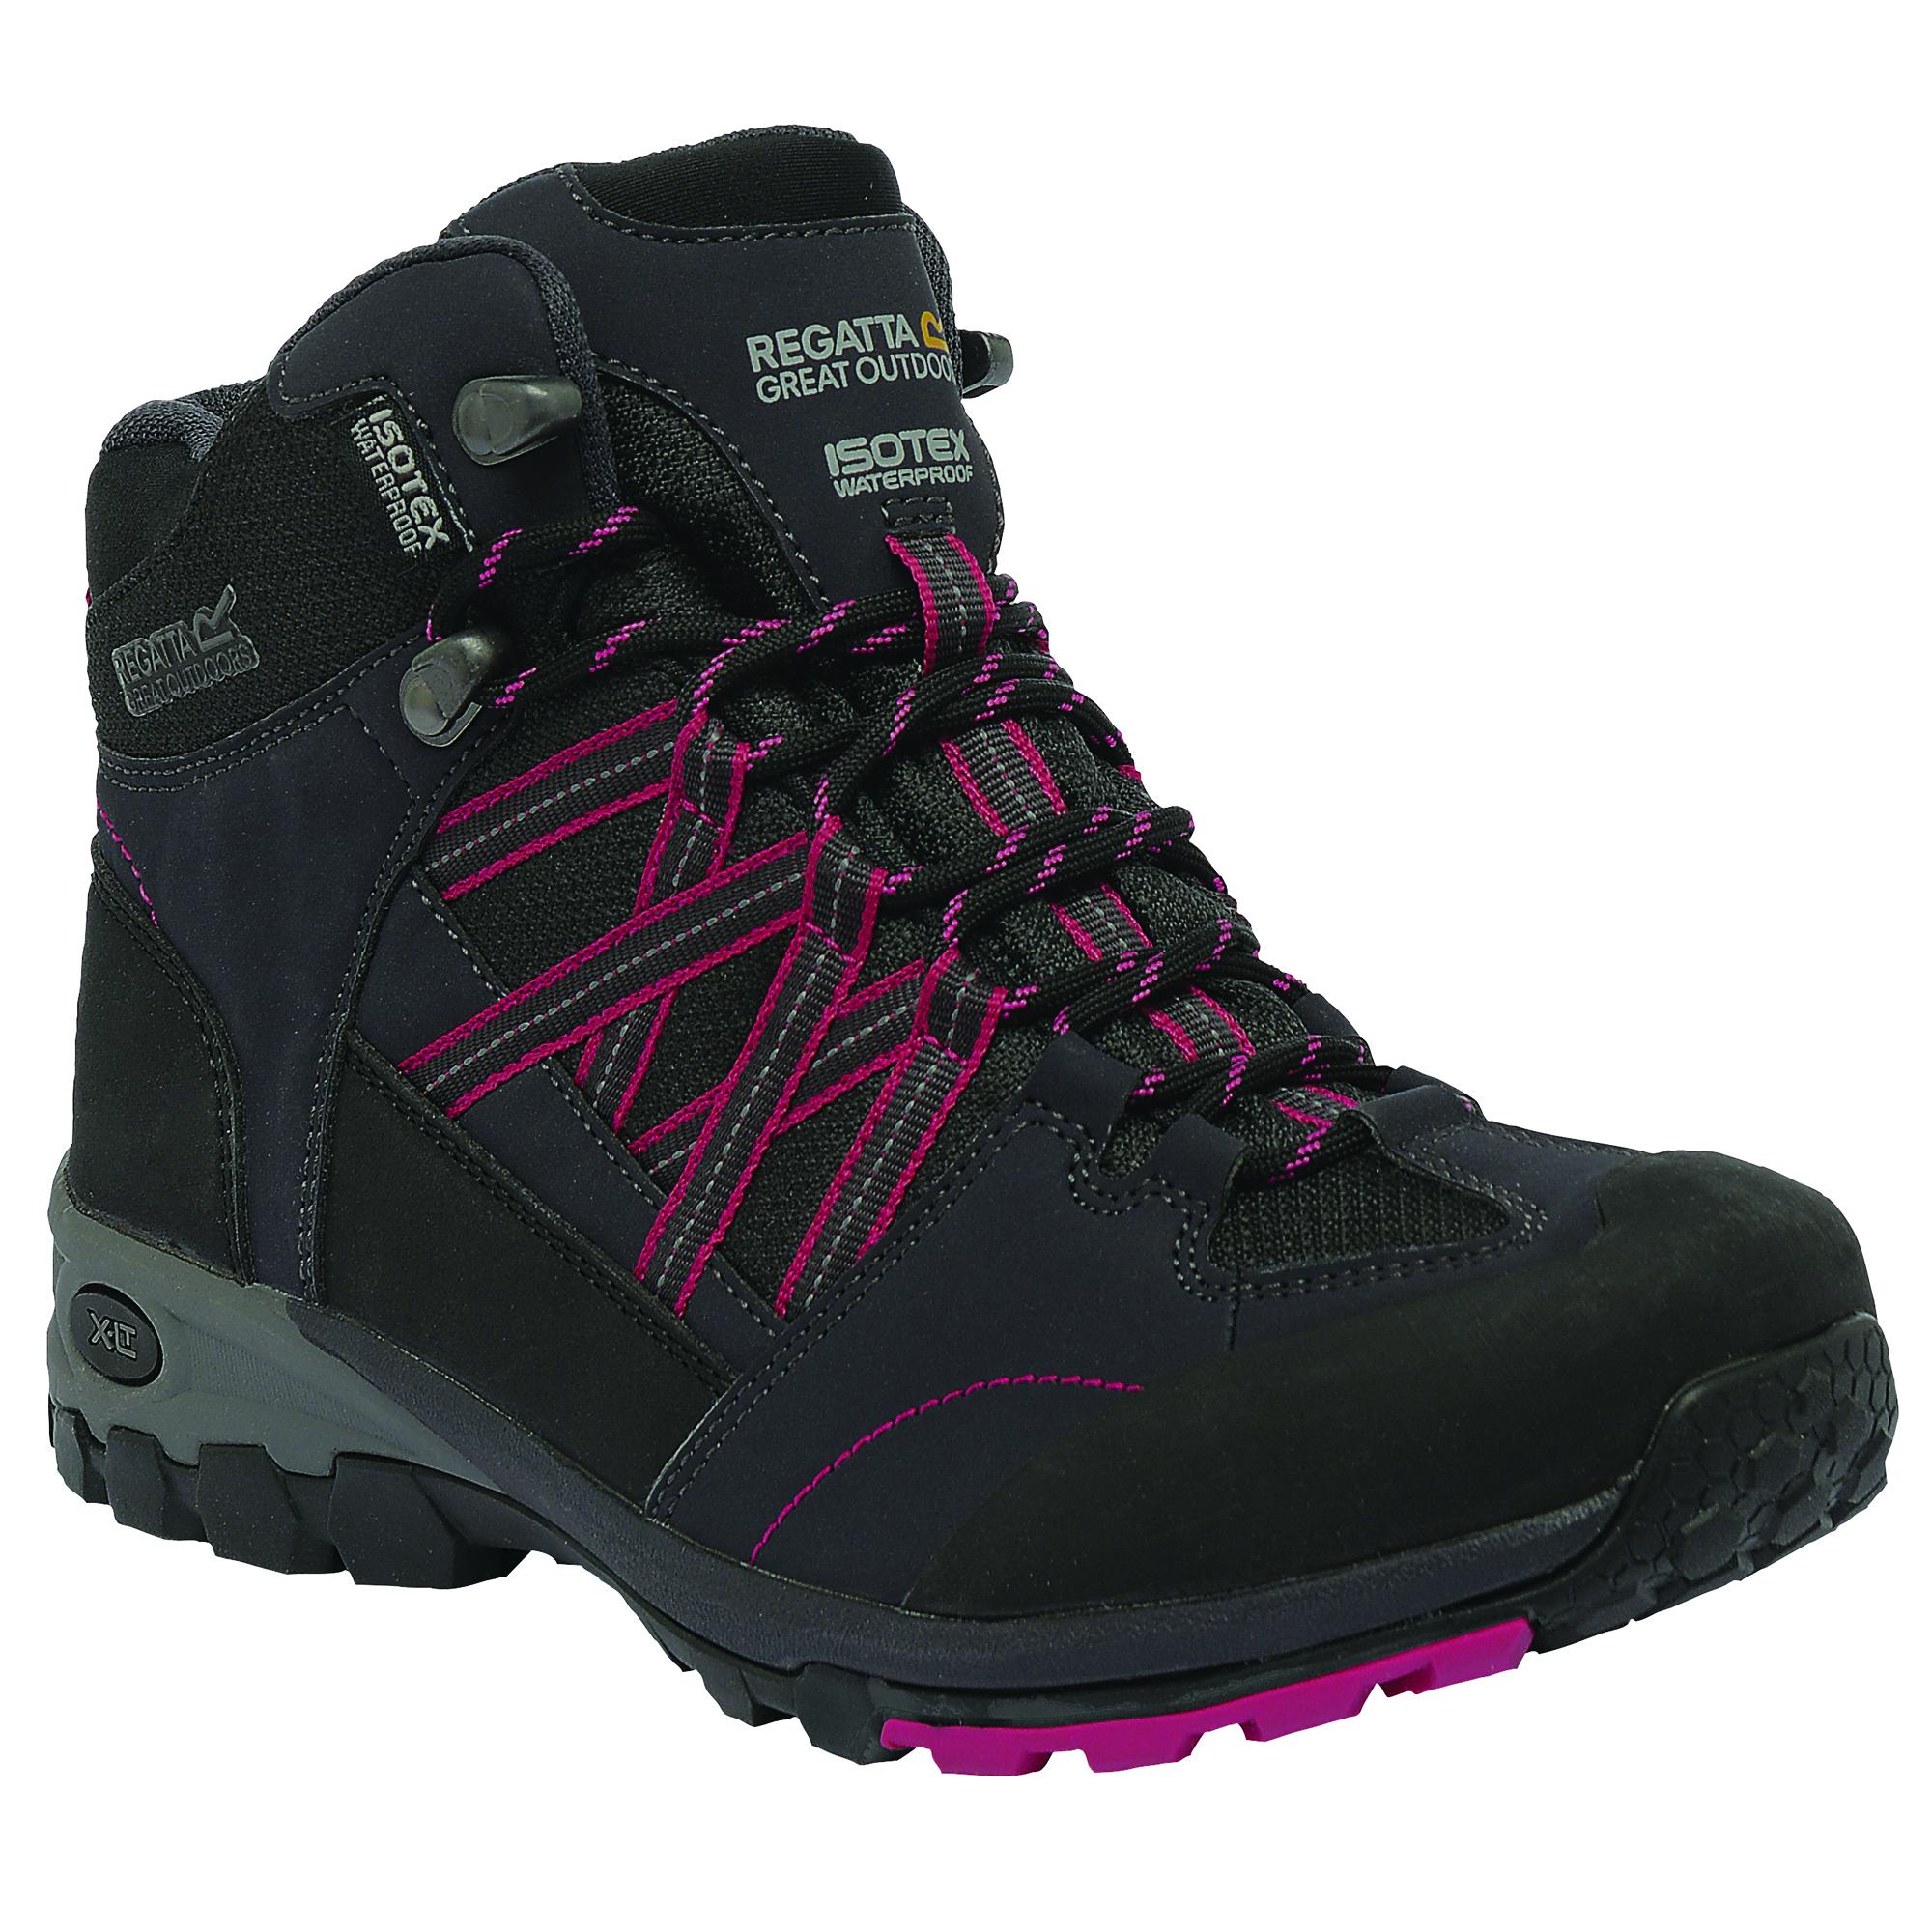 Popular Womens NorthWest WaterProof Leather Lace Up Walking Hiking Boots UK Sizes 3 To 8 | EBay